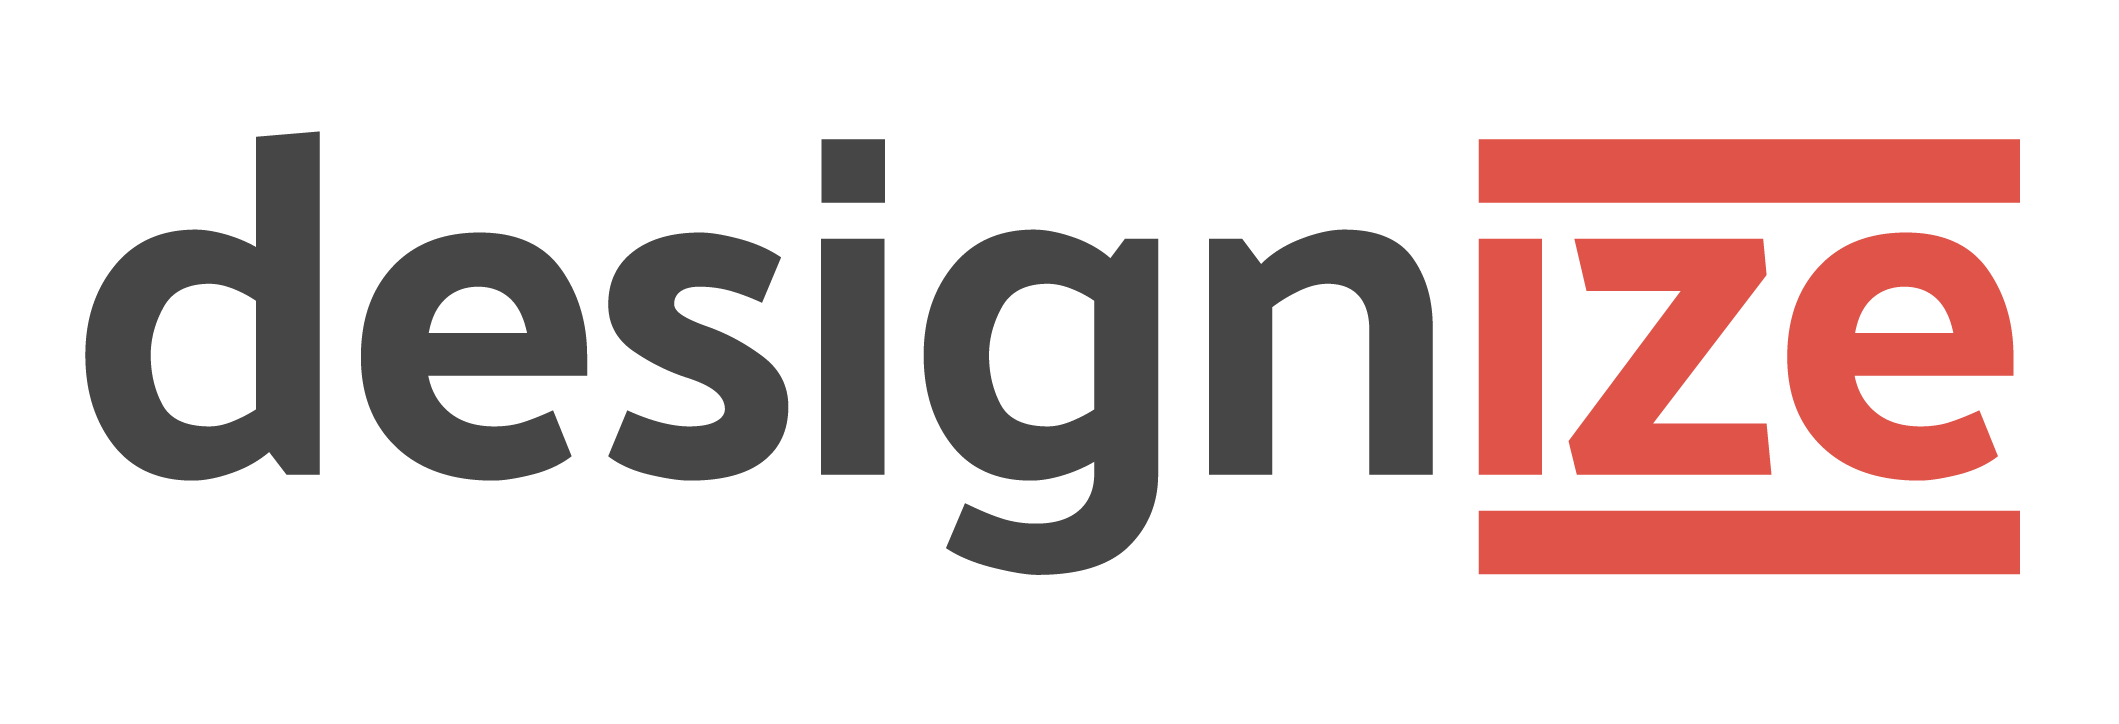 cropped-designize-logo_square-01-4.png